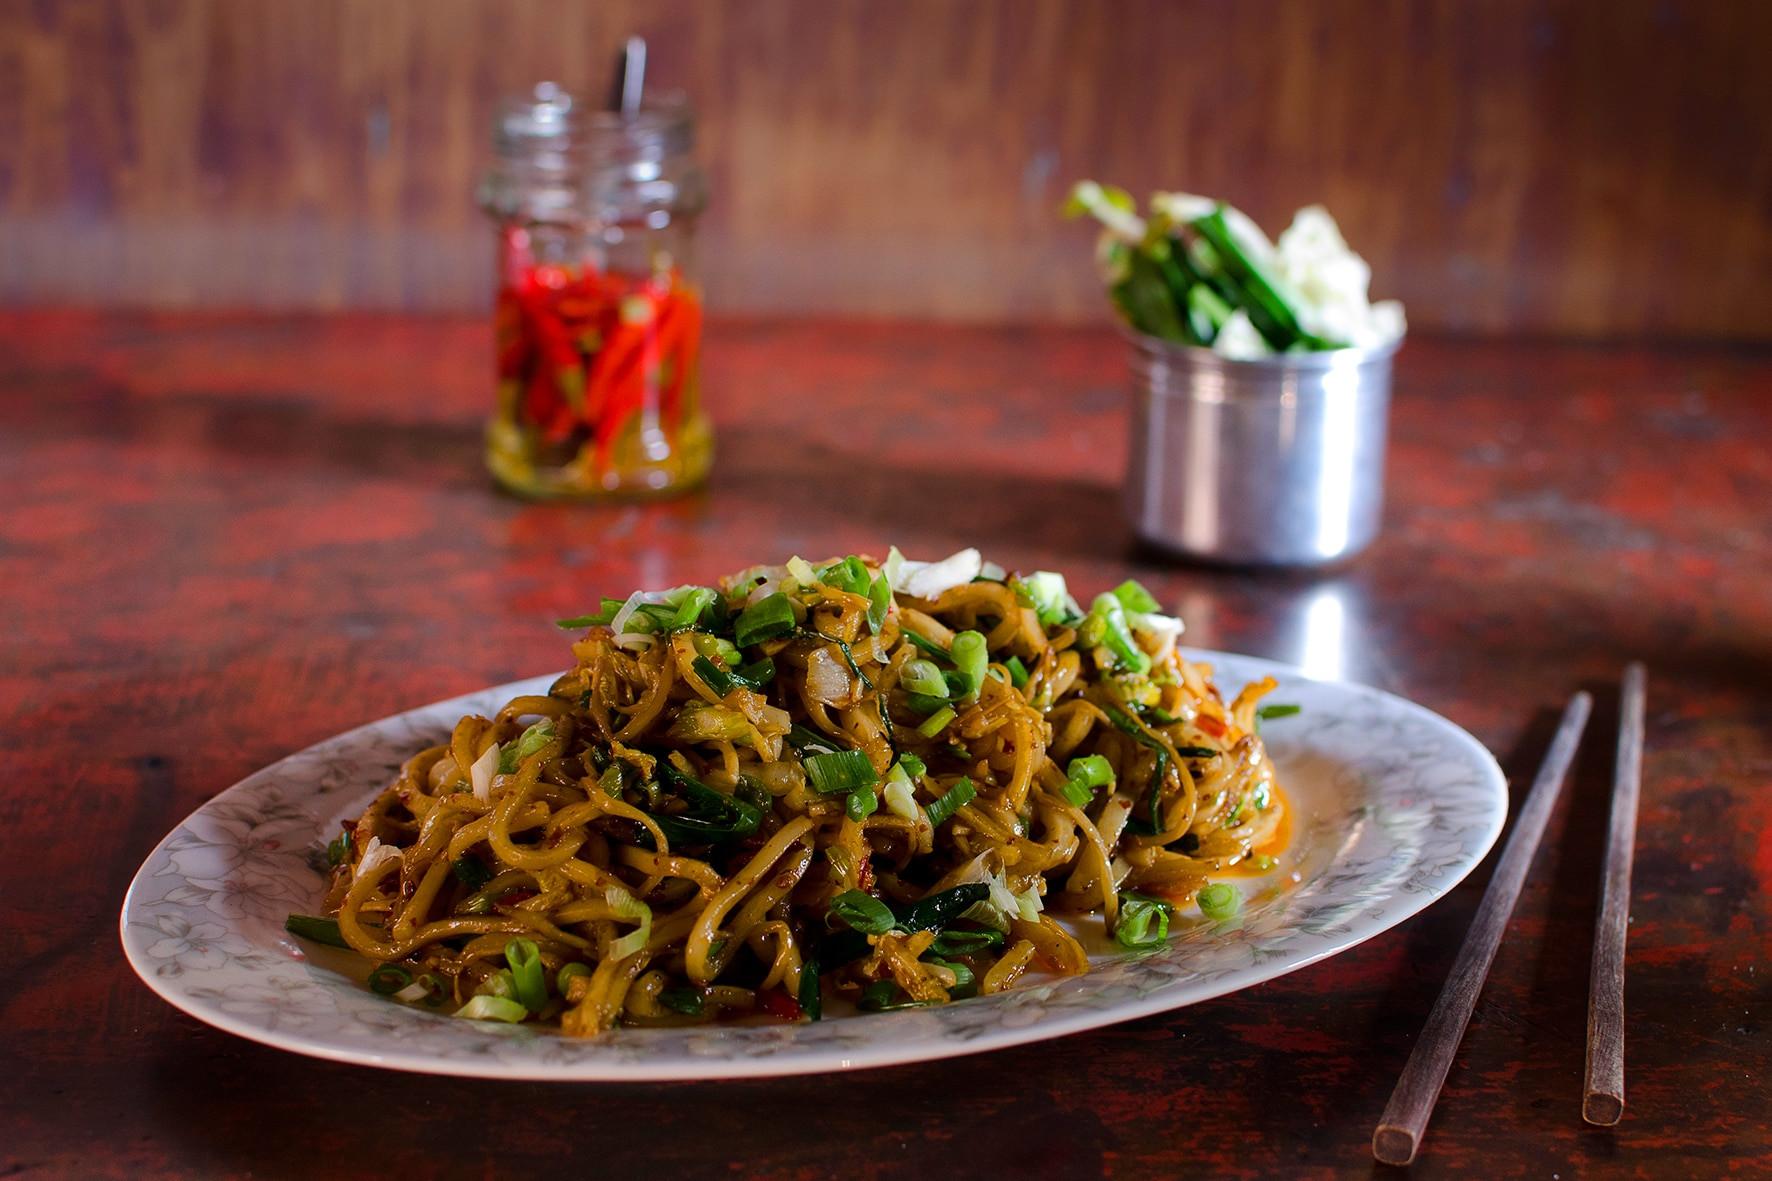 Vegetarian Rice Noodles Recipe  Dali ve arian rice noodle stir fry recipe SBS Food